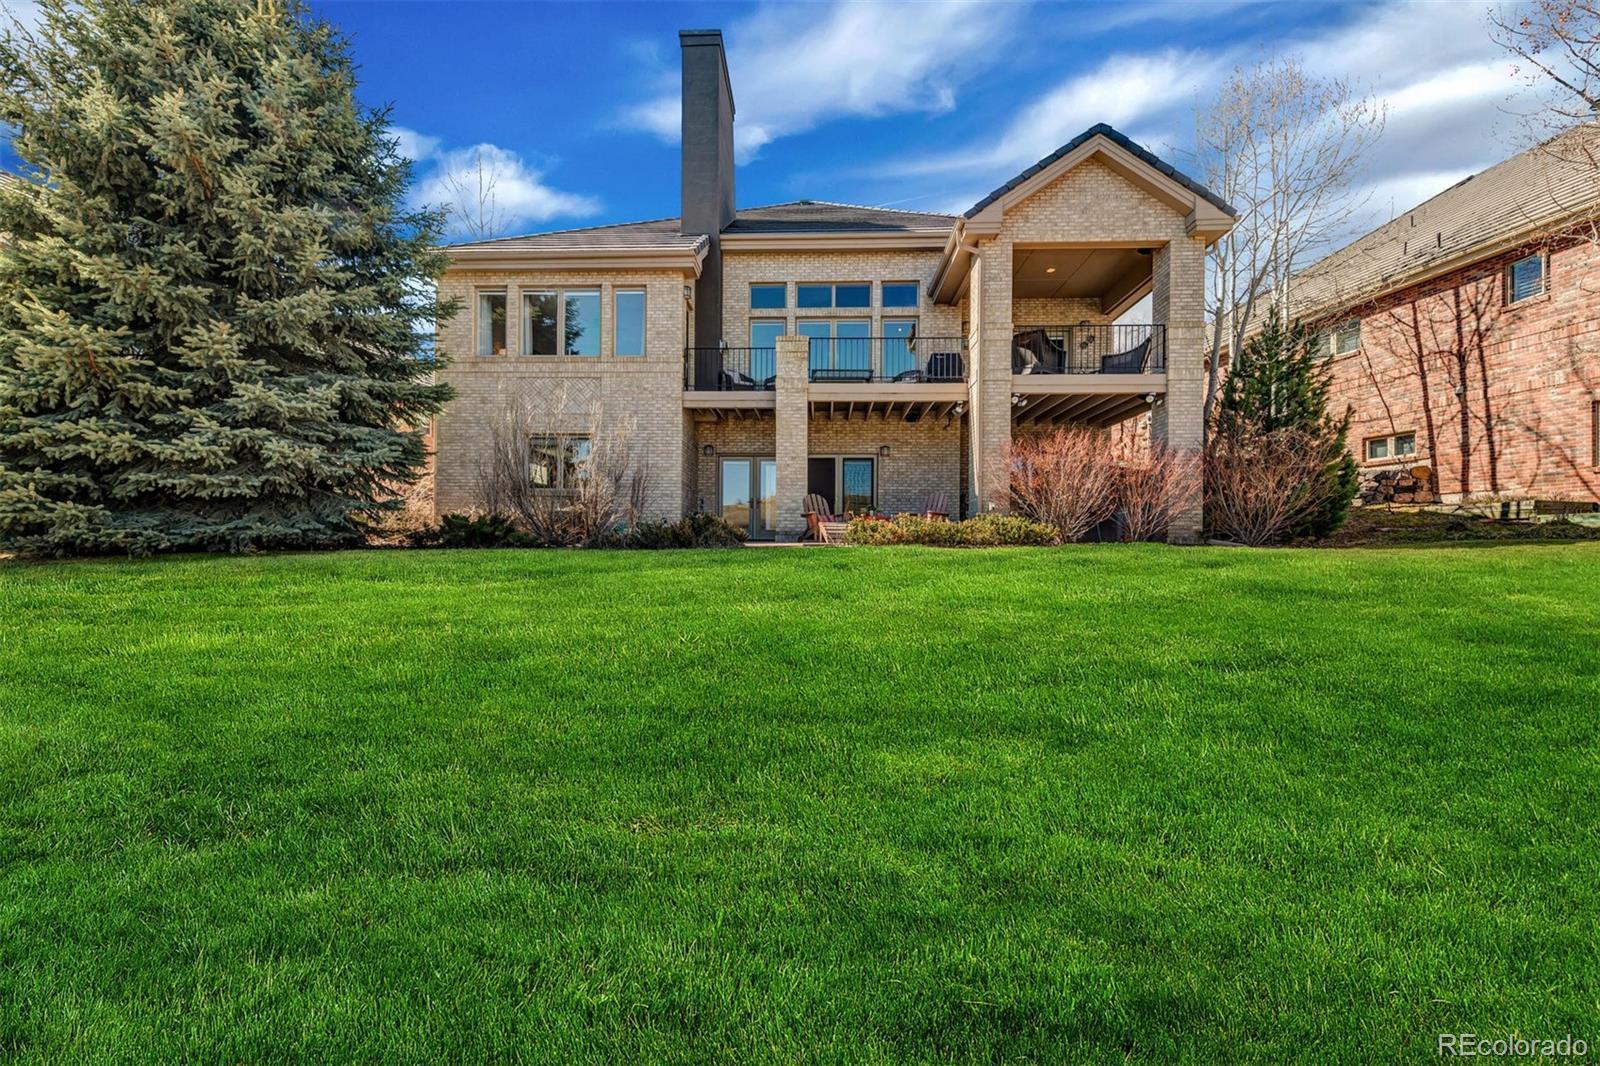 2441 S Xenon Way Property Photo - Lakewood, CO real estate listing